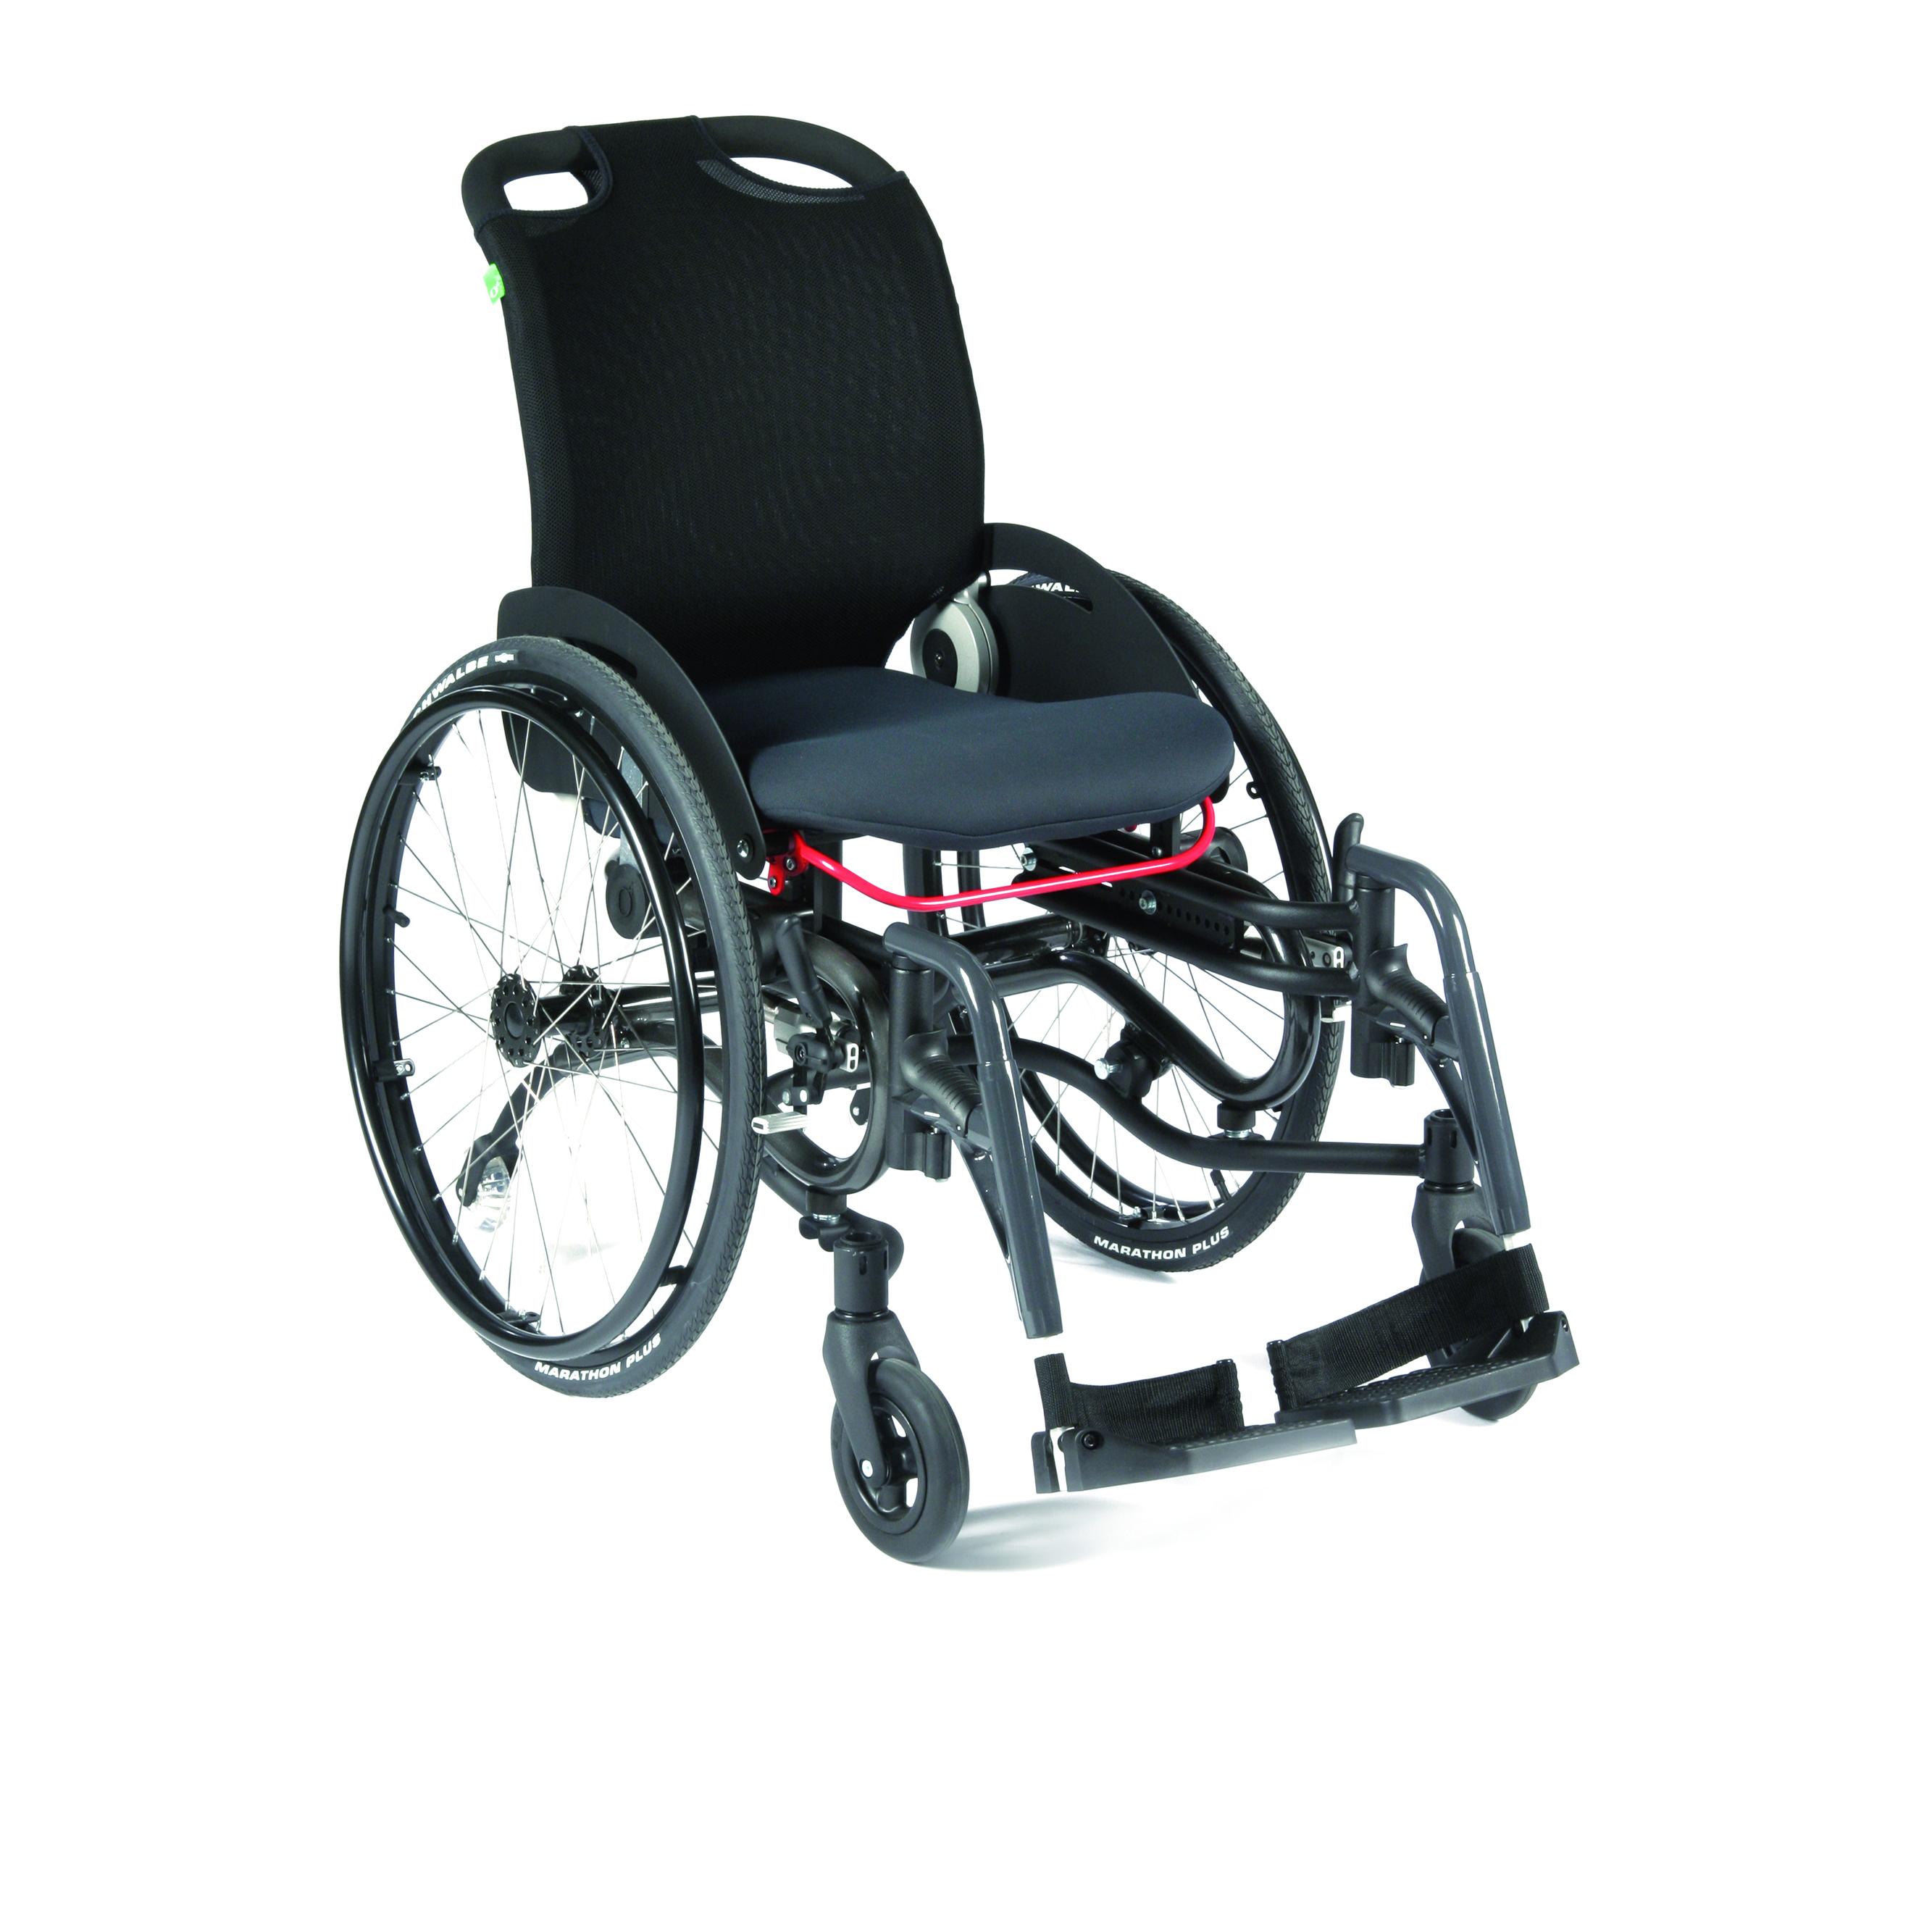 Rolstoel, rolstoel.nl, rolstoel op maat, rolstoelen, O4 Wheelchairs